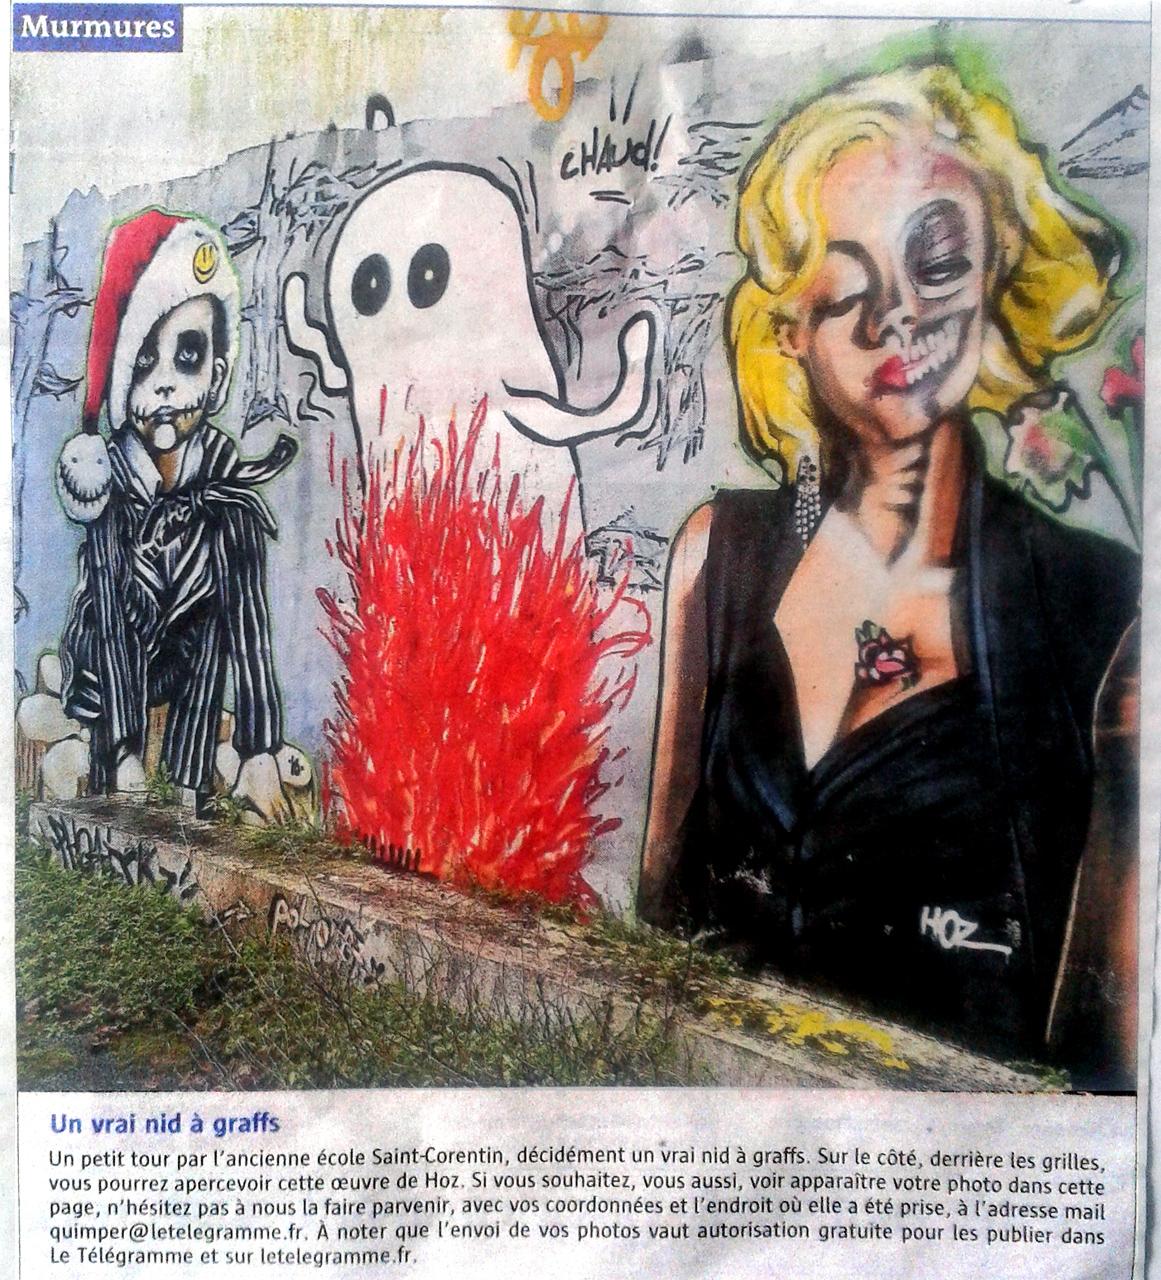 Fresque graffiti - Le Telegramme Quimper 28/04/2018